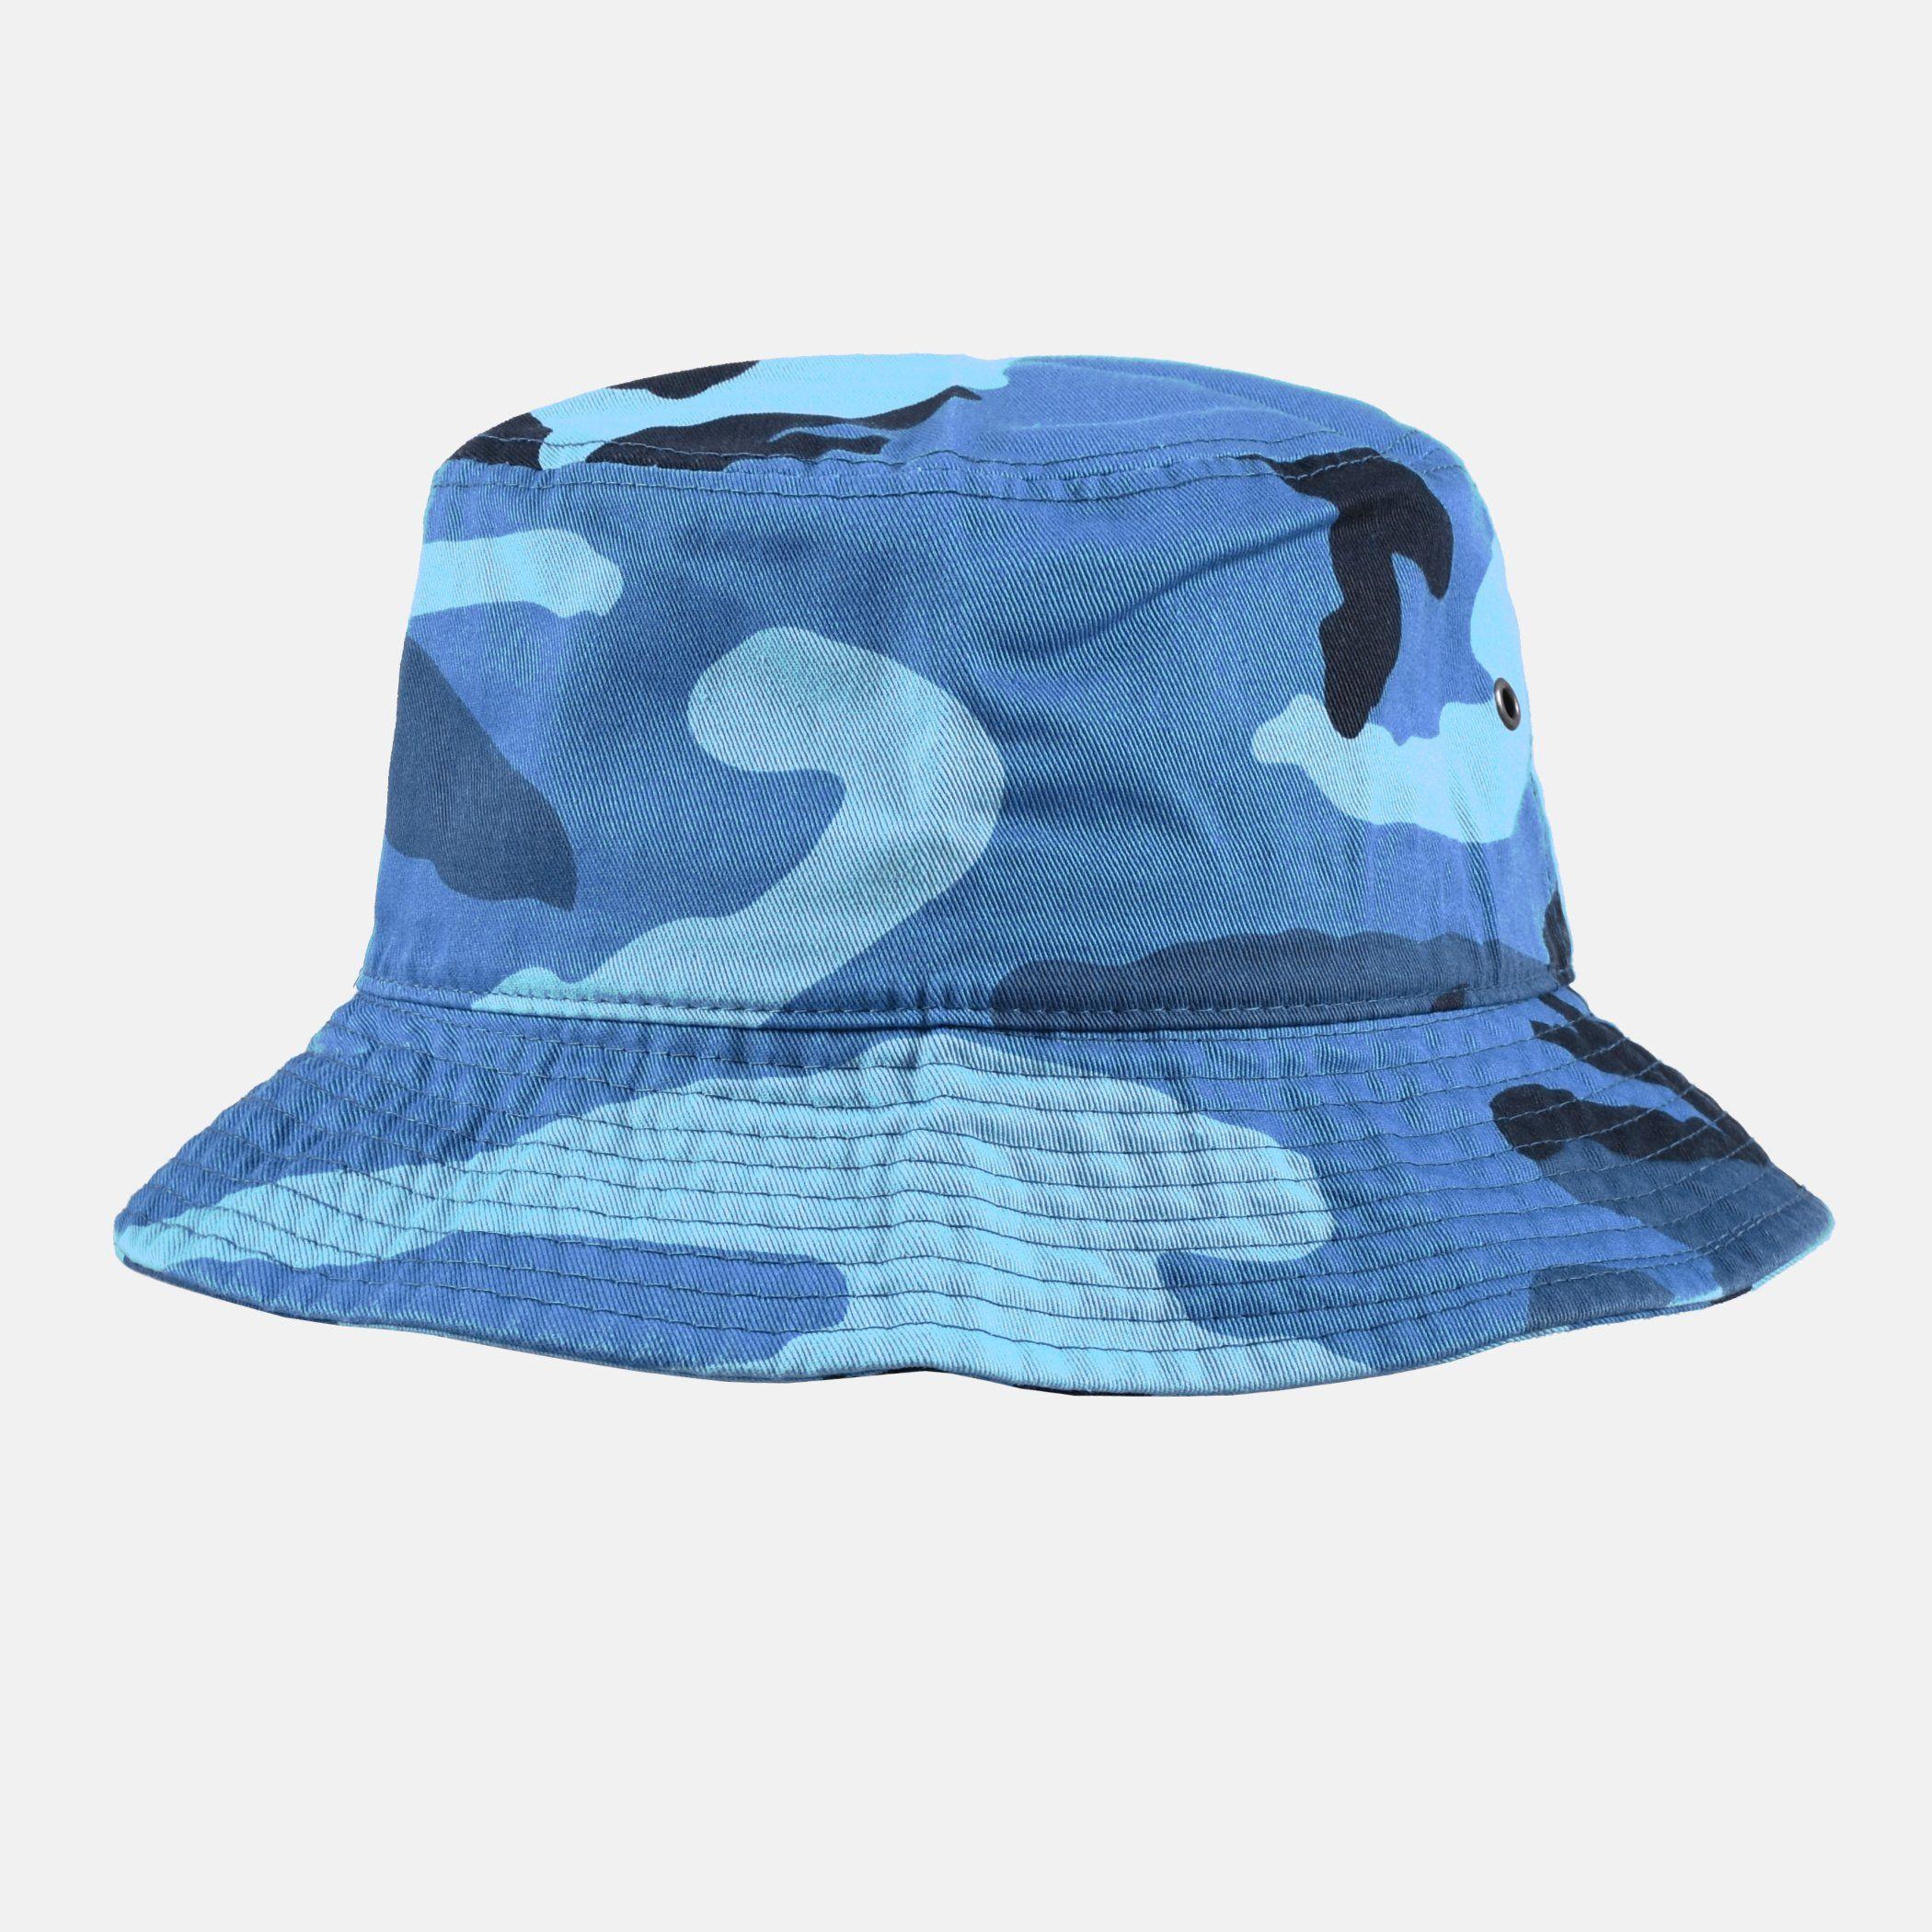 White Aesthetic Bucket Hat